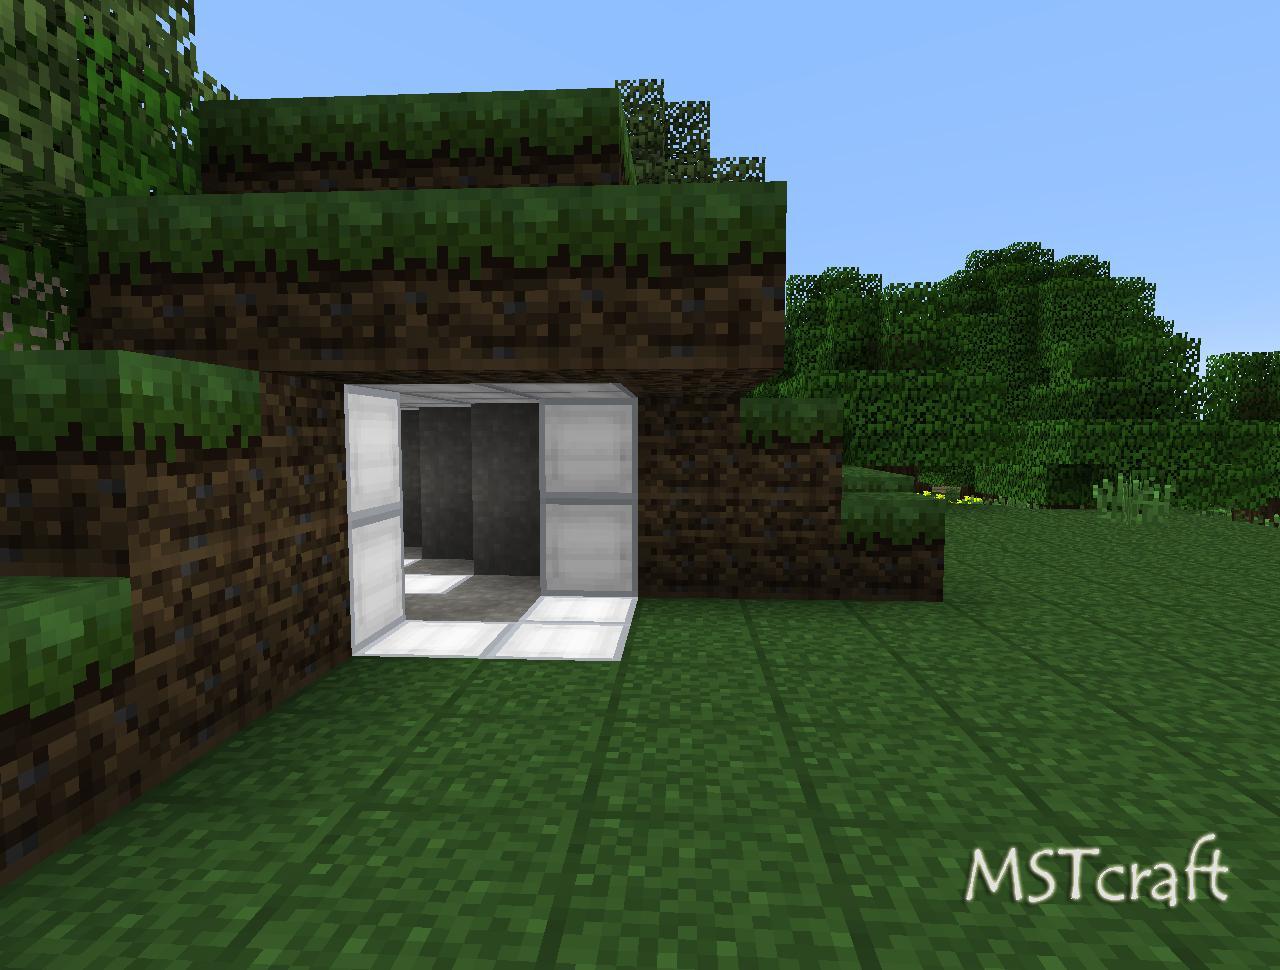 4e201  MSTCraft texture pack 2 [1.5.2/1.5.1] [16x] MSTCraft Texture Pack Download